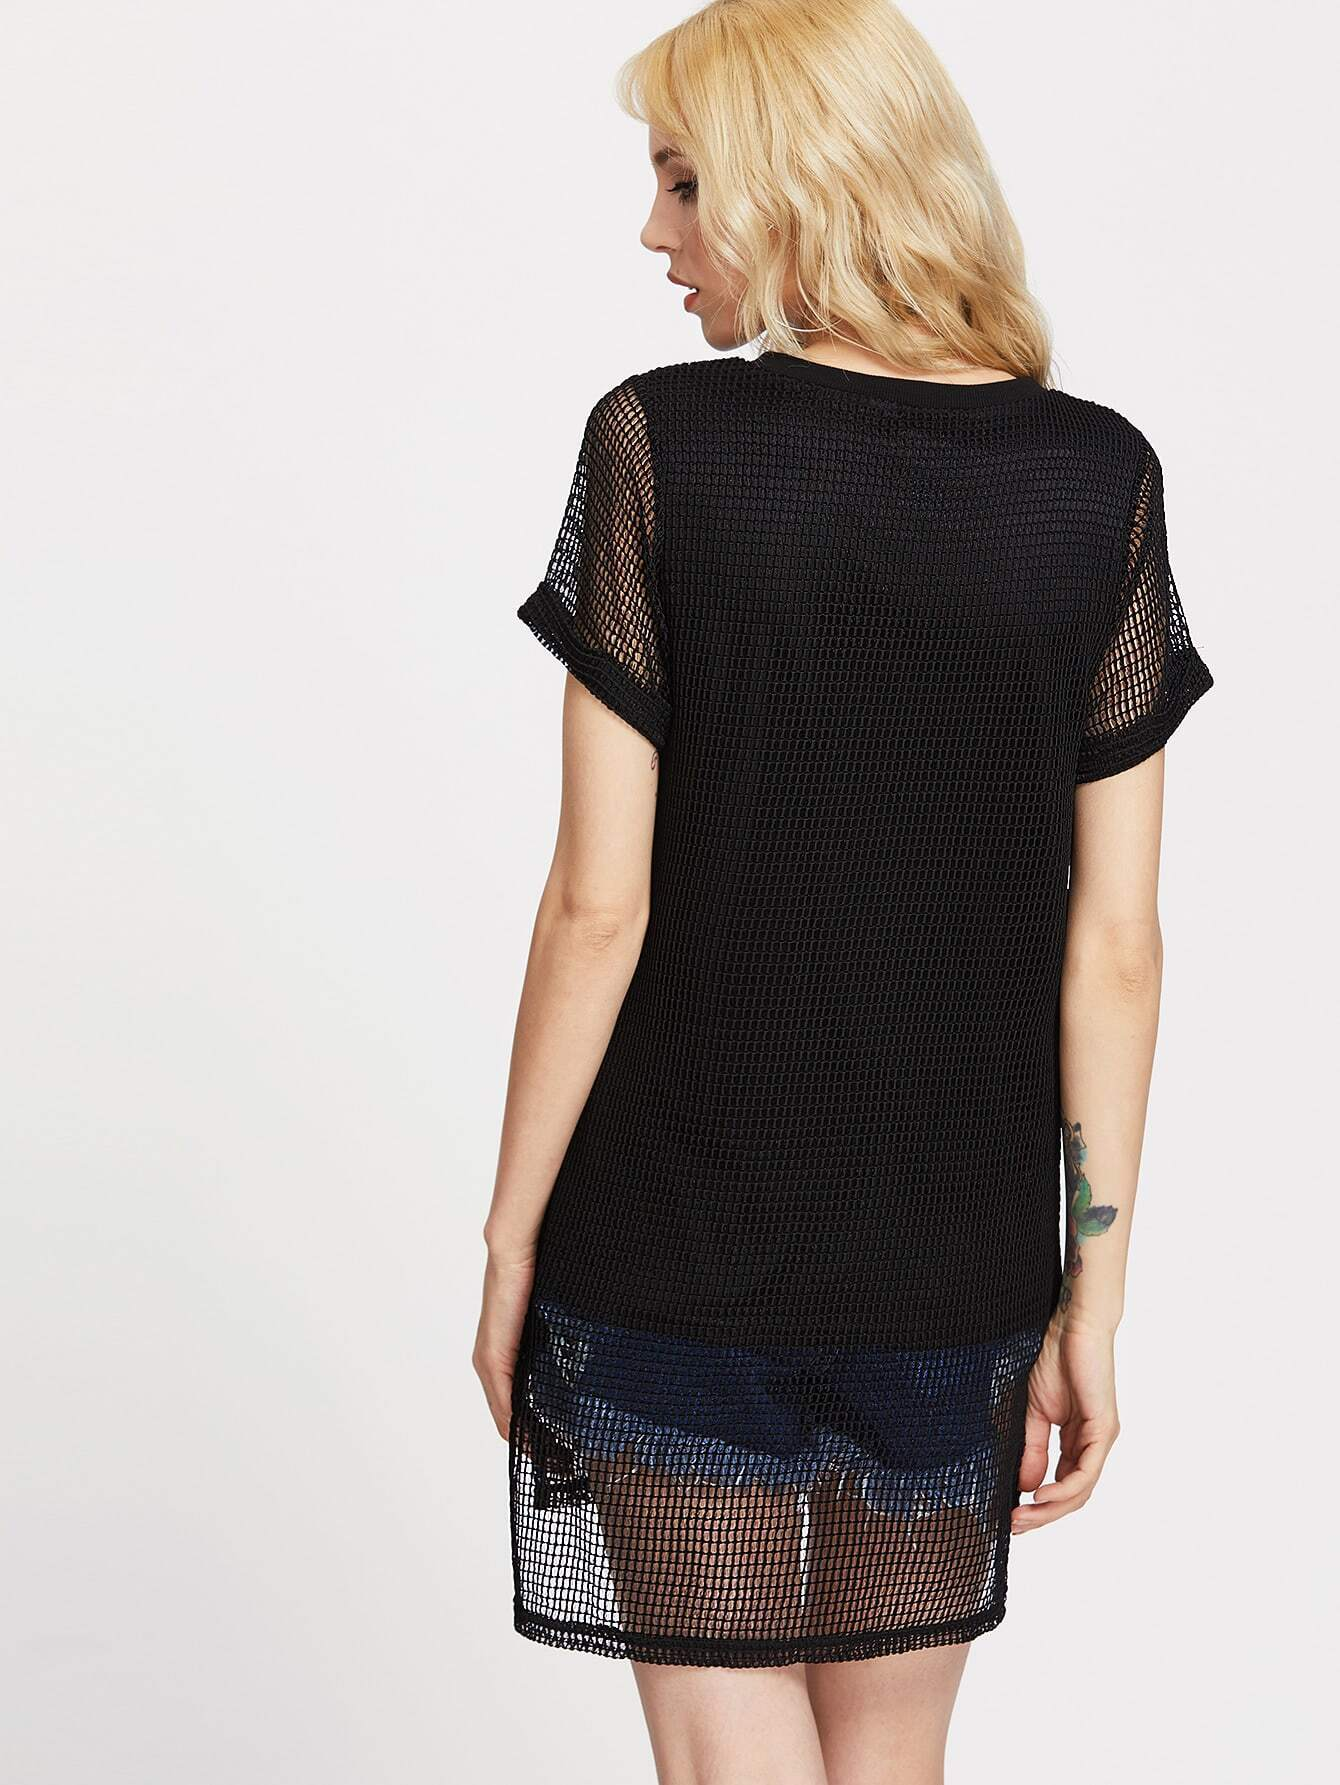 blouse170403451_2